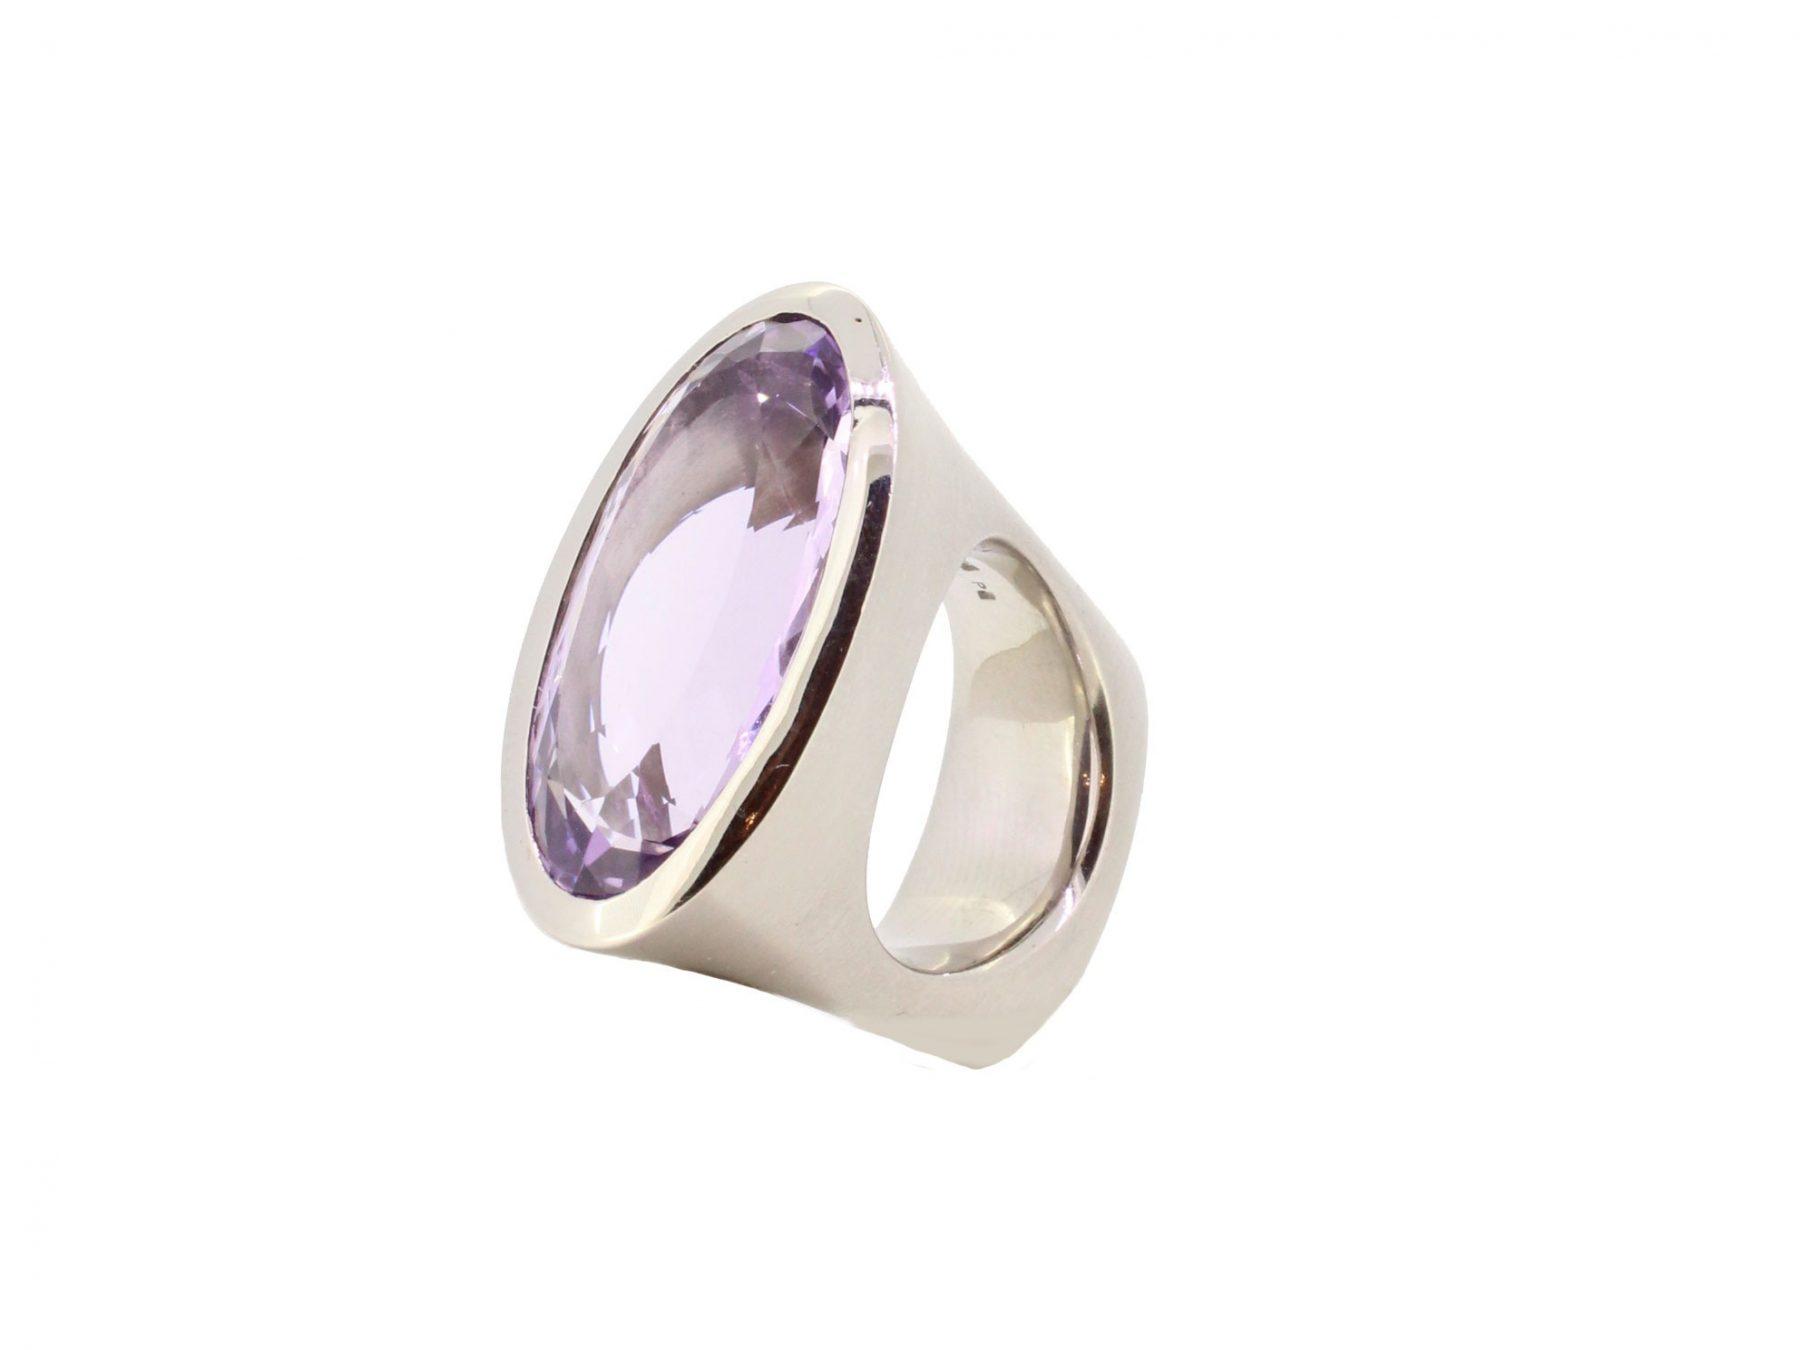 Ring Amethyst 950 Palladium - Individuelle Marken - R-4468